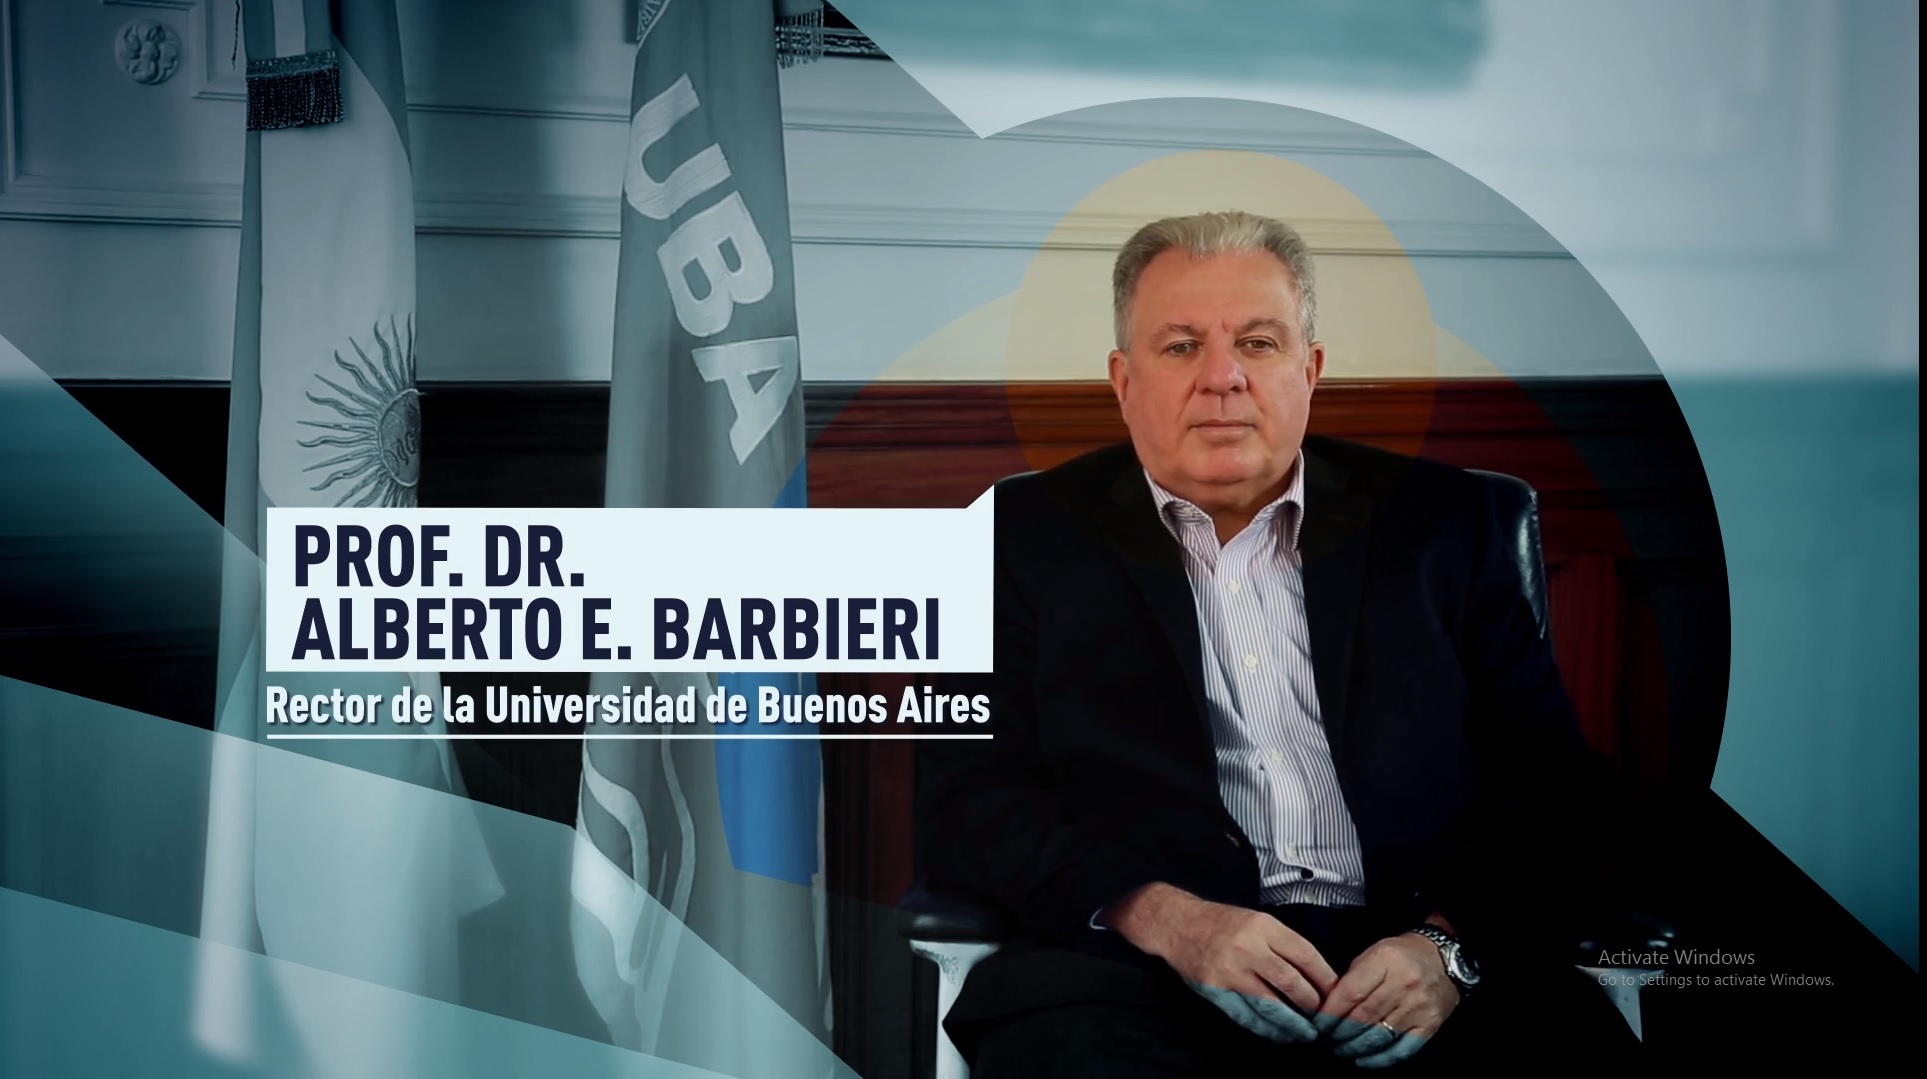 Soy UBA - Profesor Dr. Alberto E. Barbieri